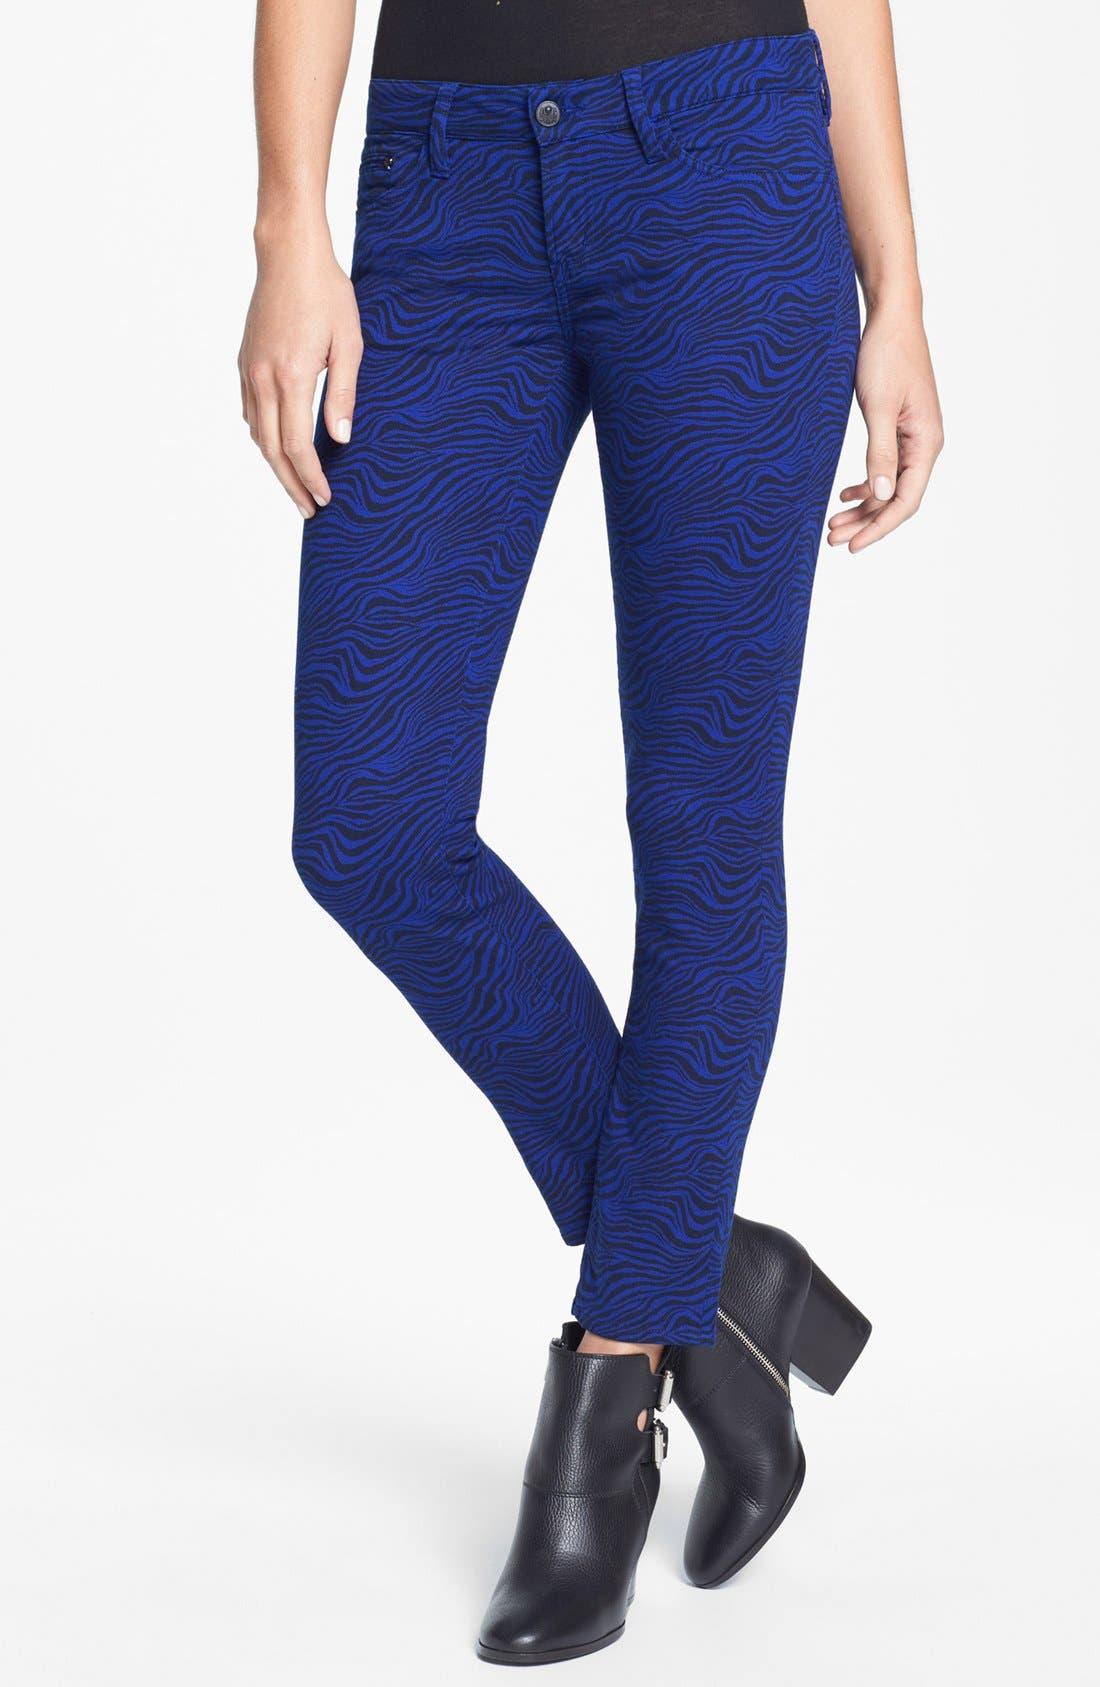 Main Image - The Kooples Zebra Print Stretch Skinny Jeans